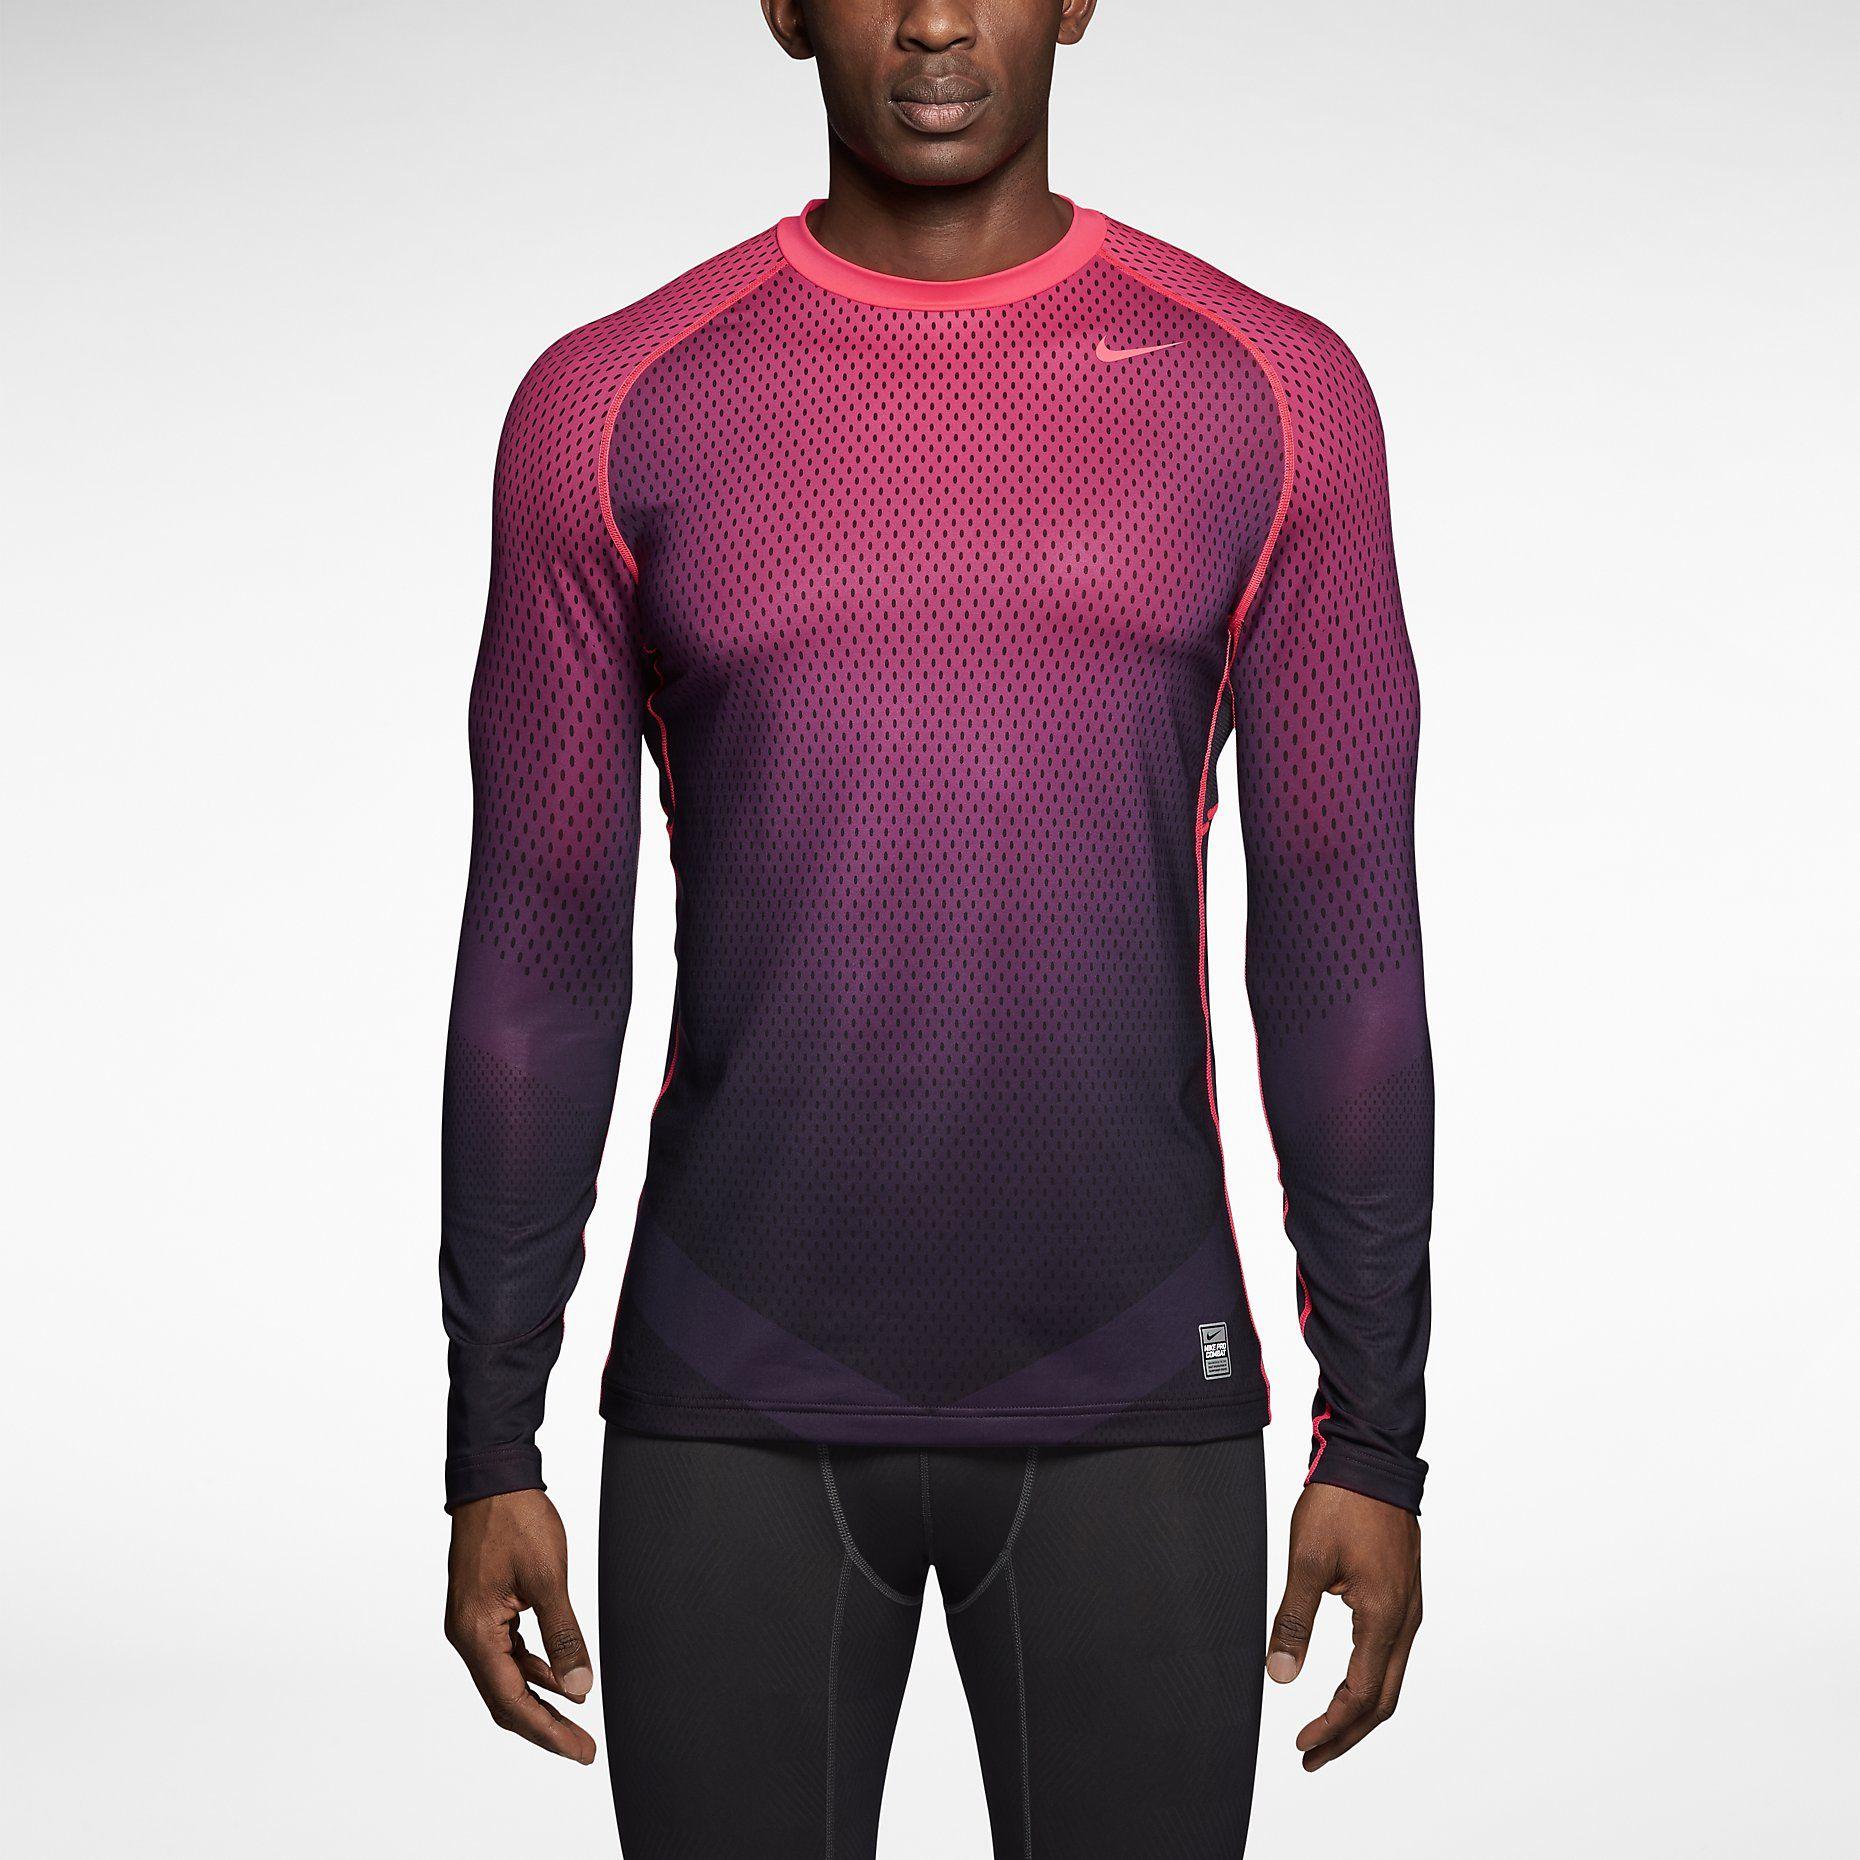 247481bc7 Nike Pro Combat Hyperwarm Dri-FIT Max Fitted Chameleon Long-Sleeve Crew Men's  Shirt. Nike Store HyperPunch $50